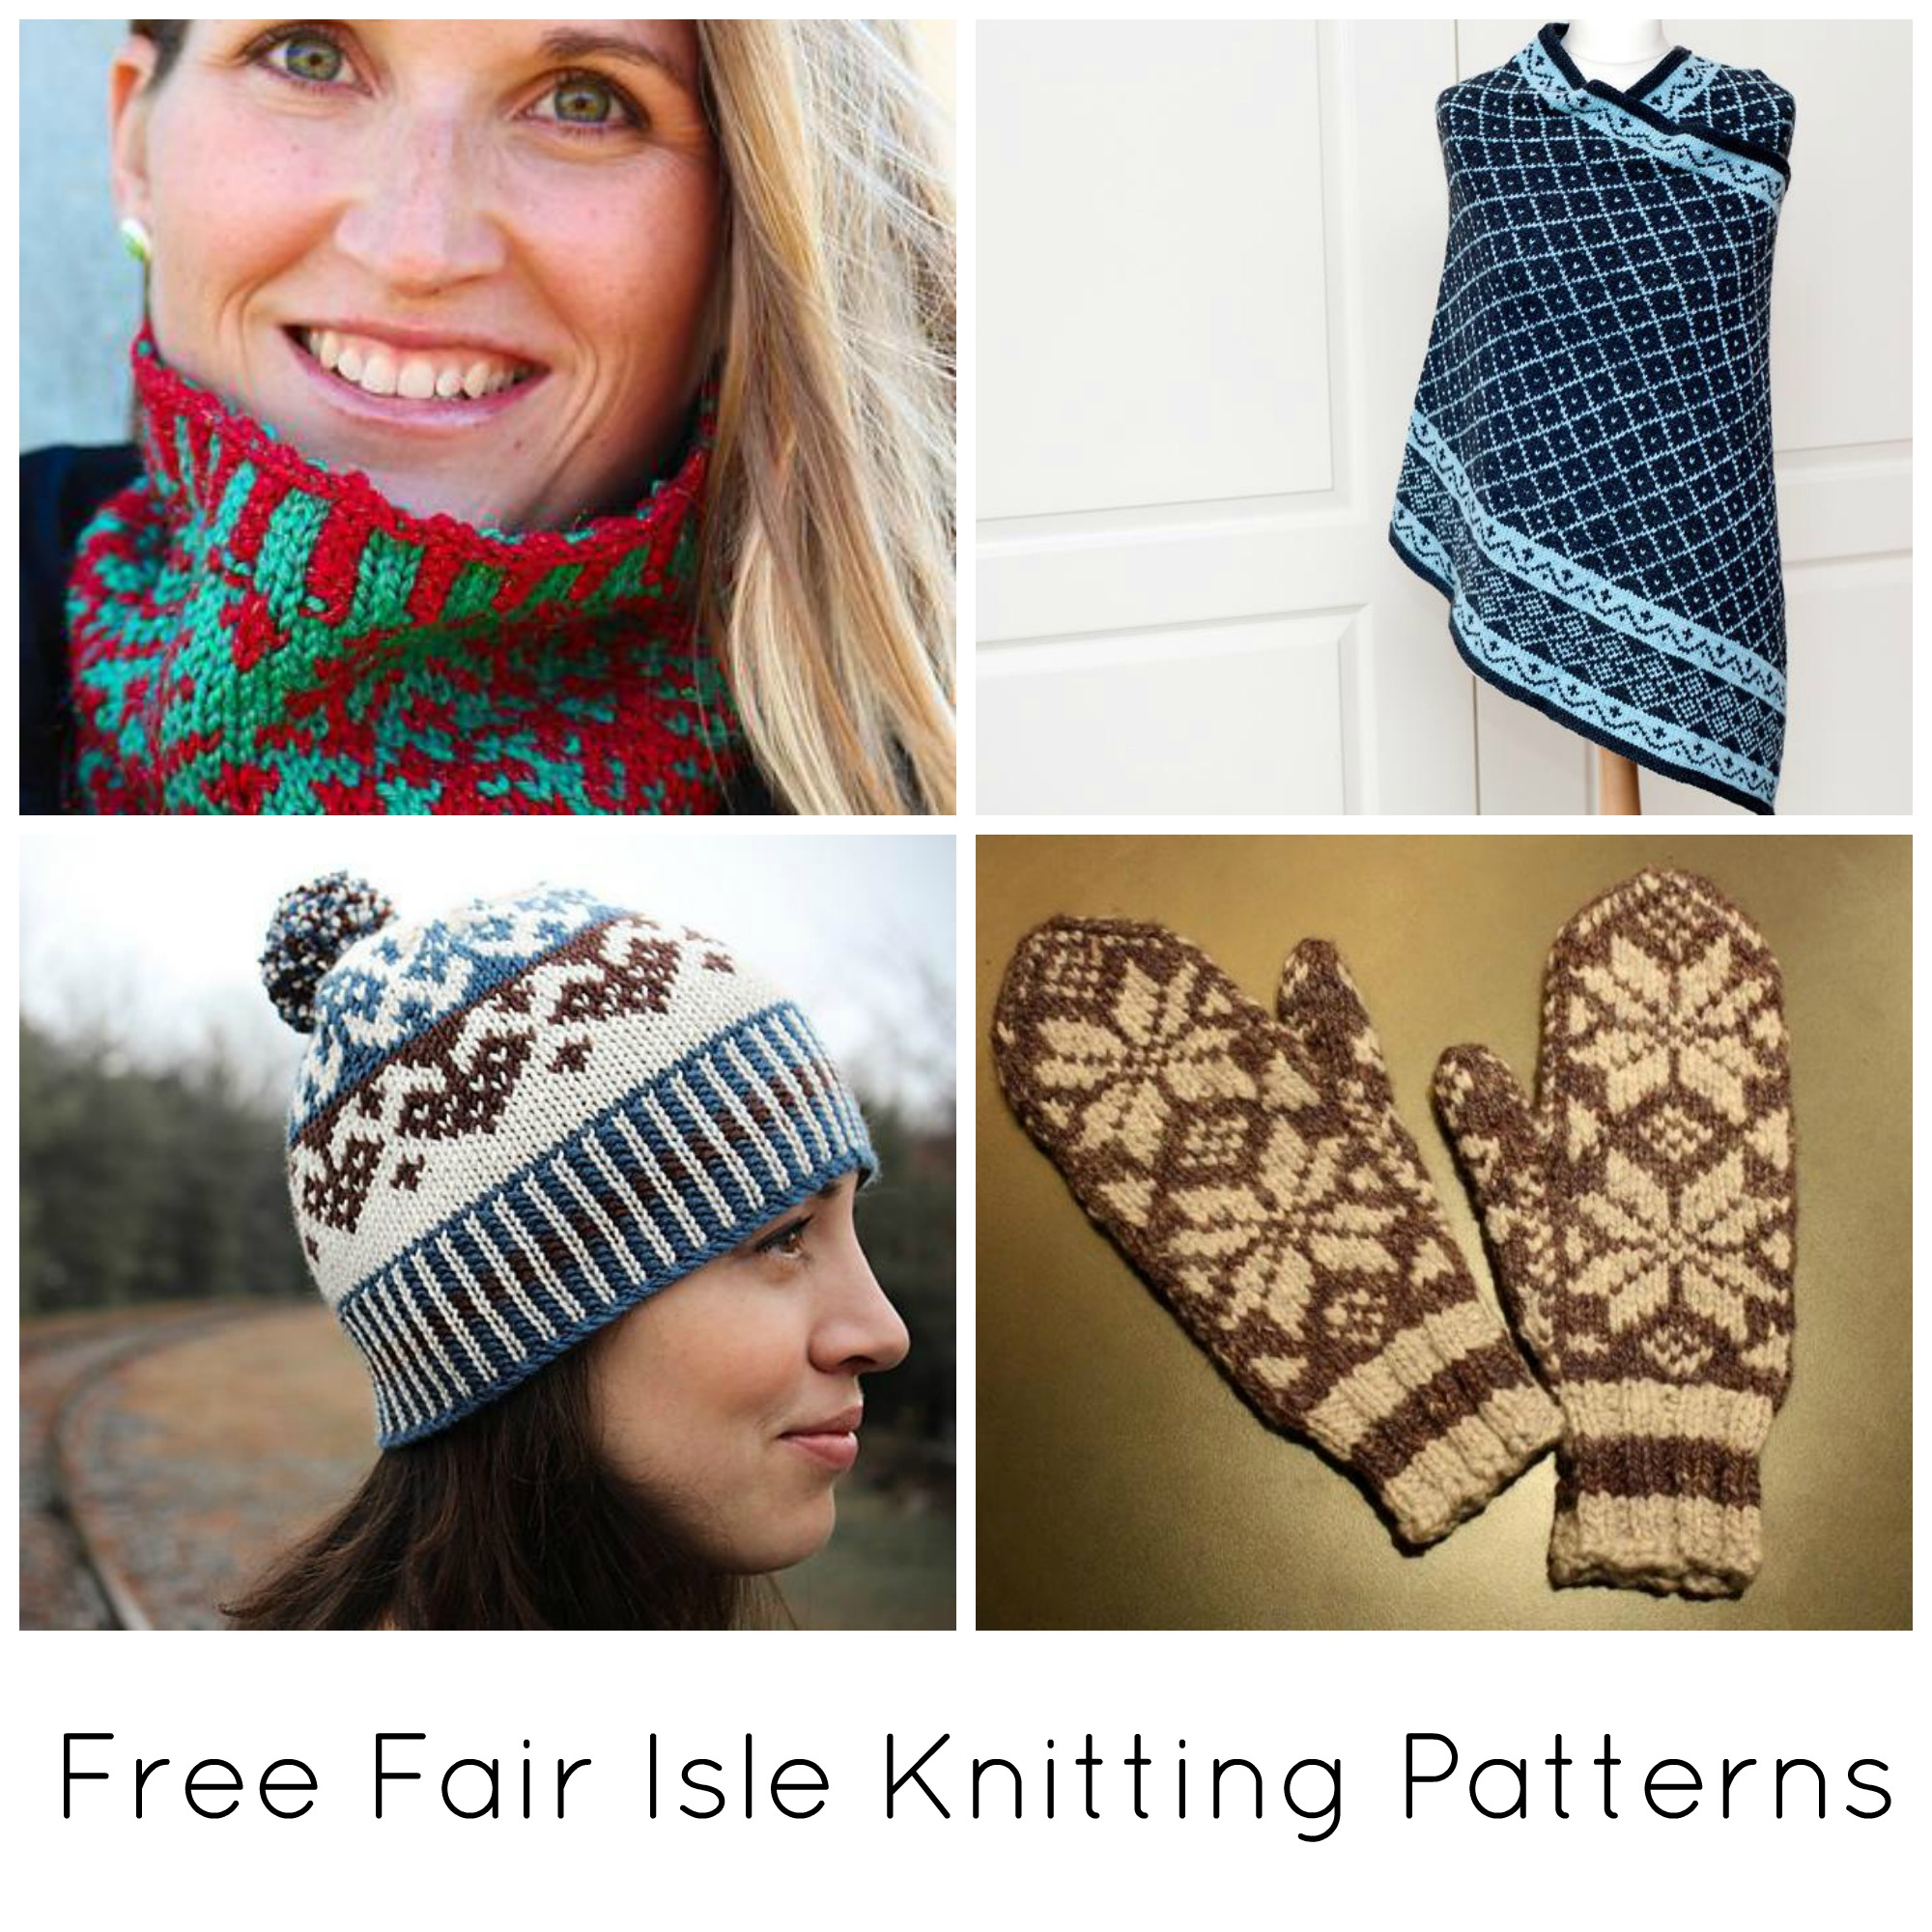 Fairisle Knitting Patterns Free 10 Free Fair Isle Knitting Patterns On Craftsy